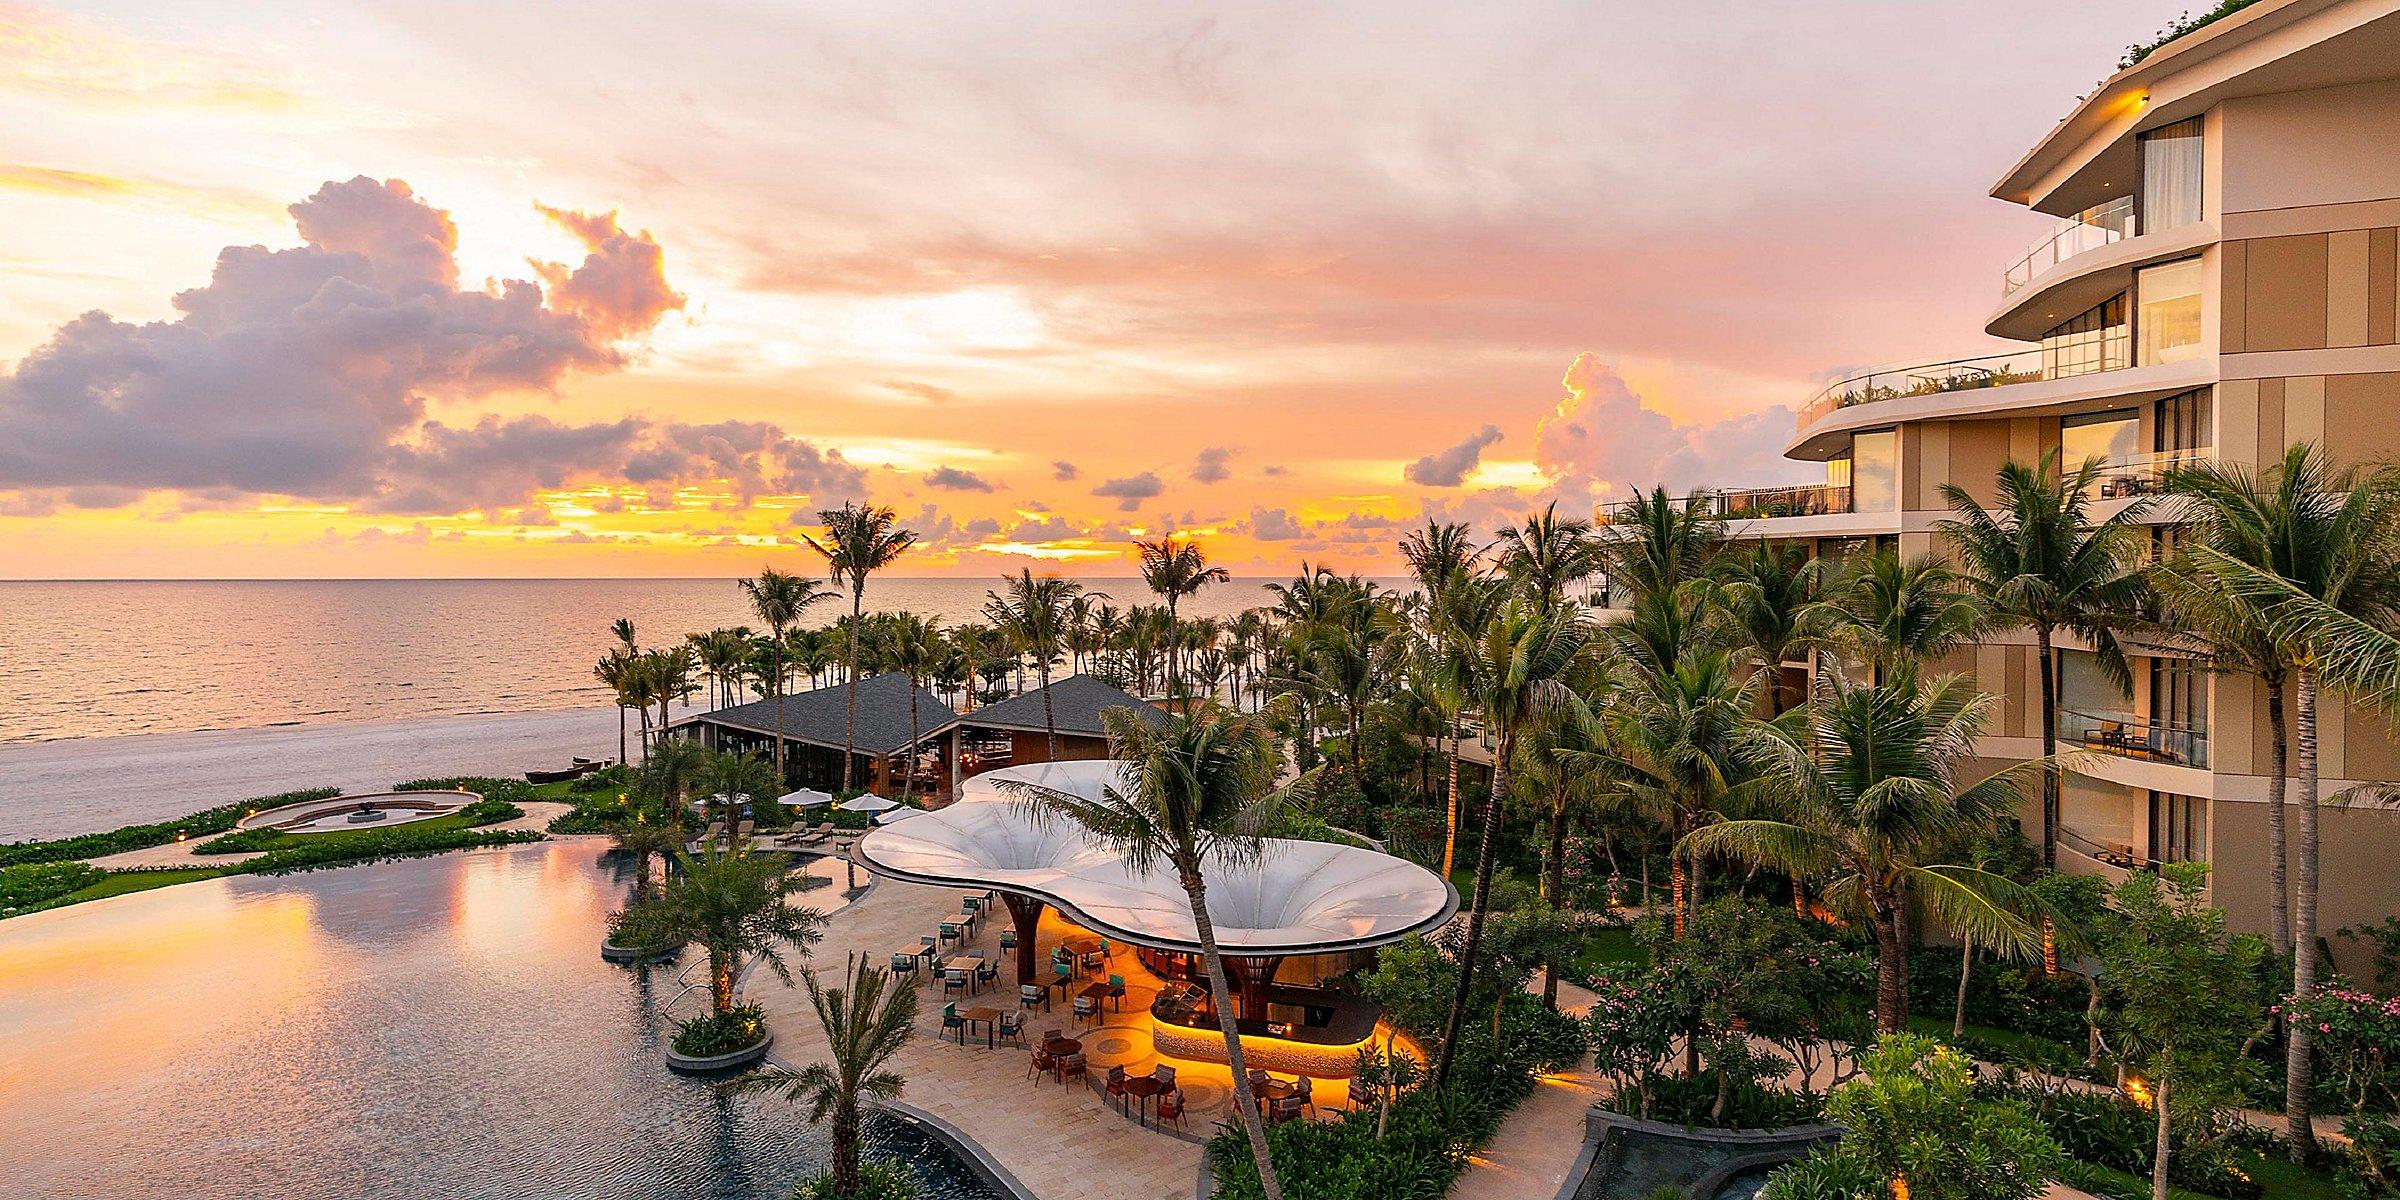 10 Mejores Playas de Vietnam